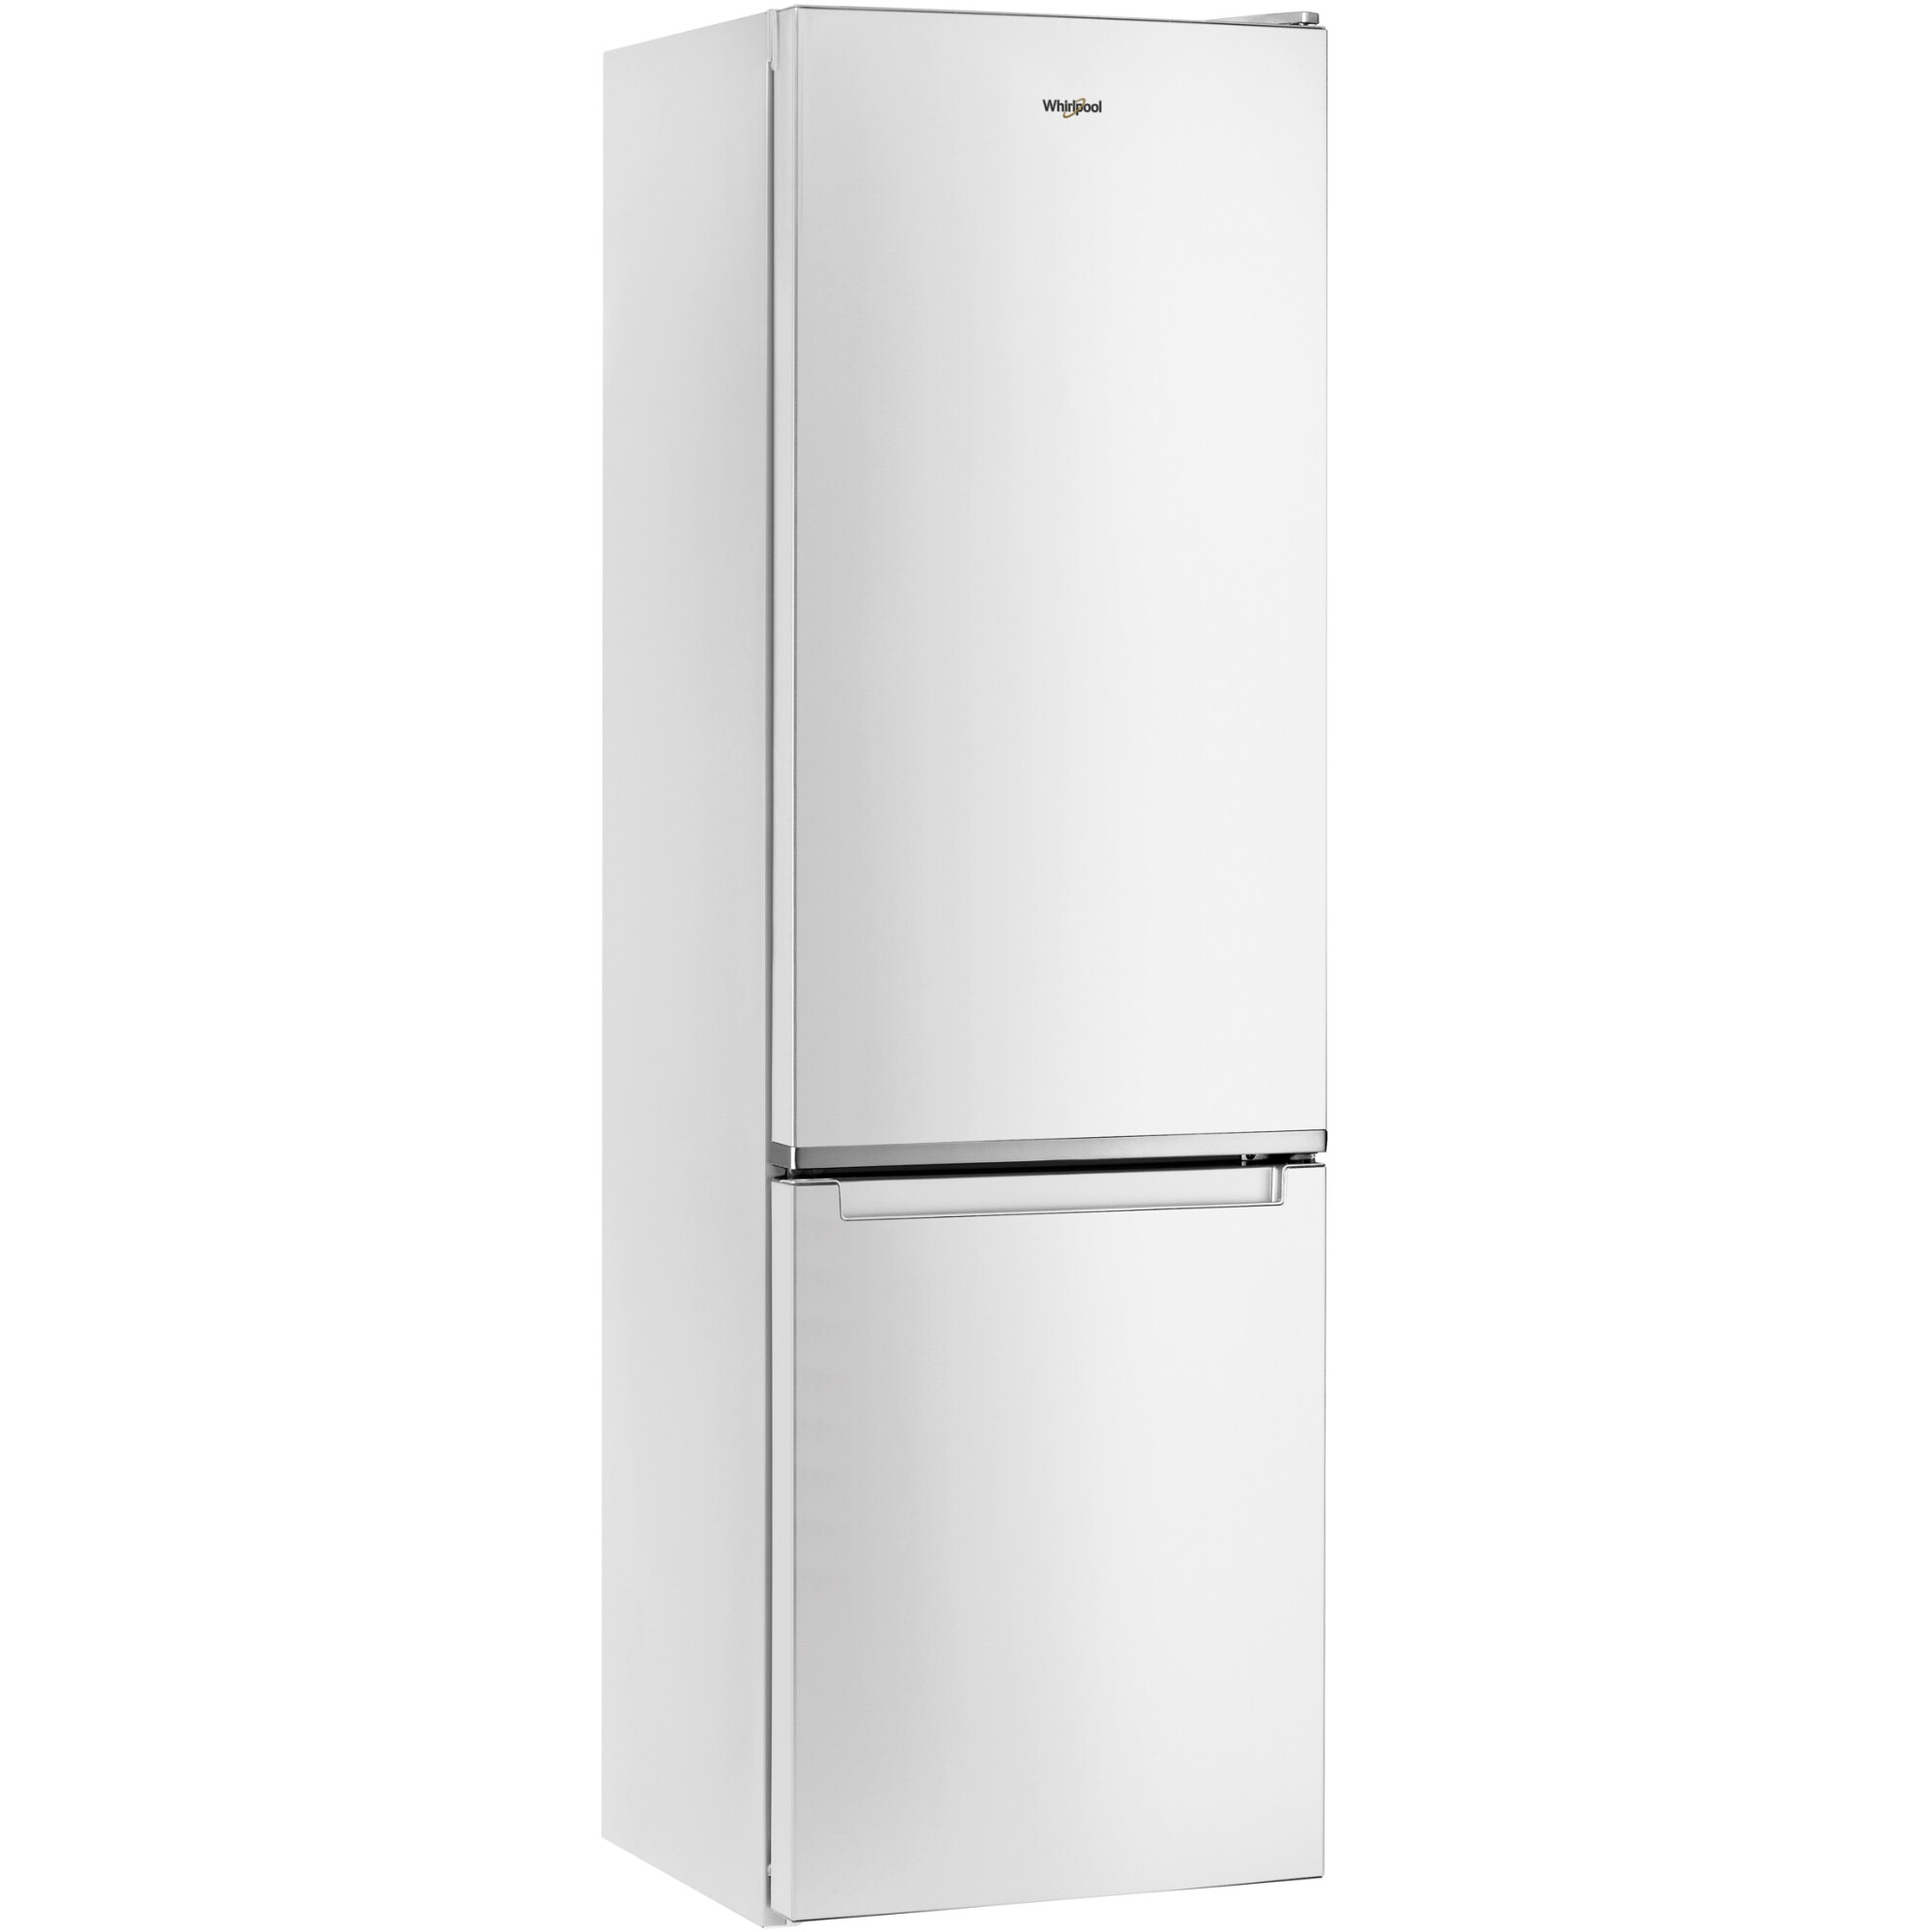 Fotografie Combina frigorifica Whirlpool W9921CW, 348l, Clasa E, Dual No Frost, 6th Sense, H 201 cm, Alb